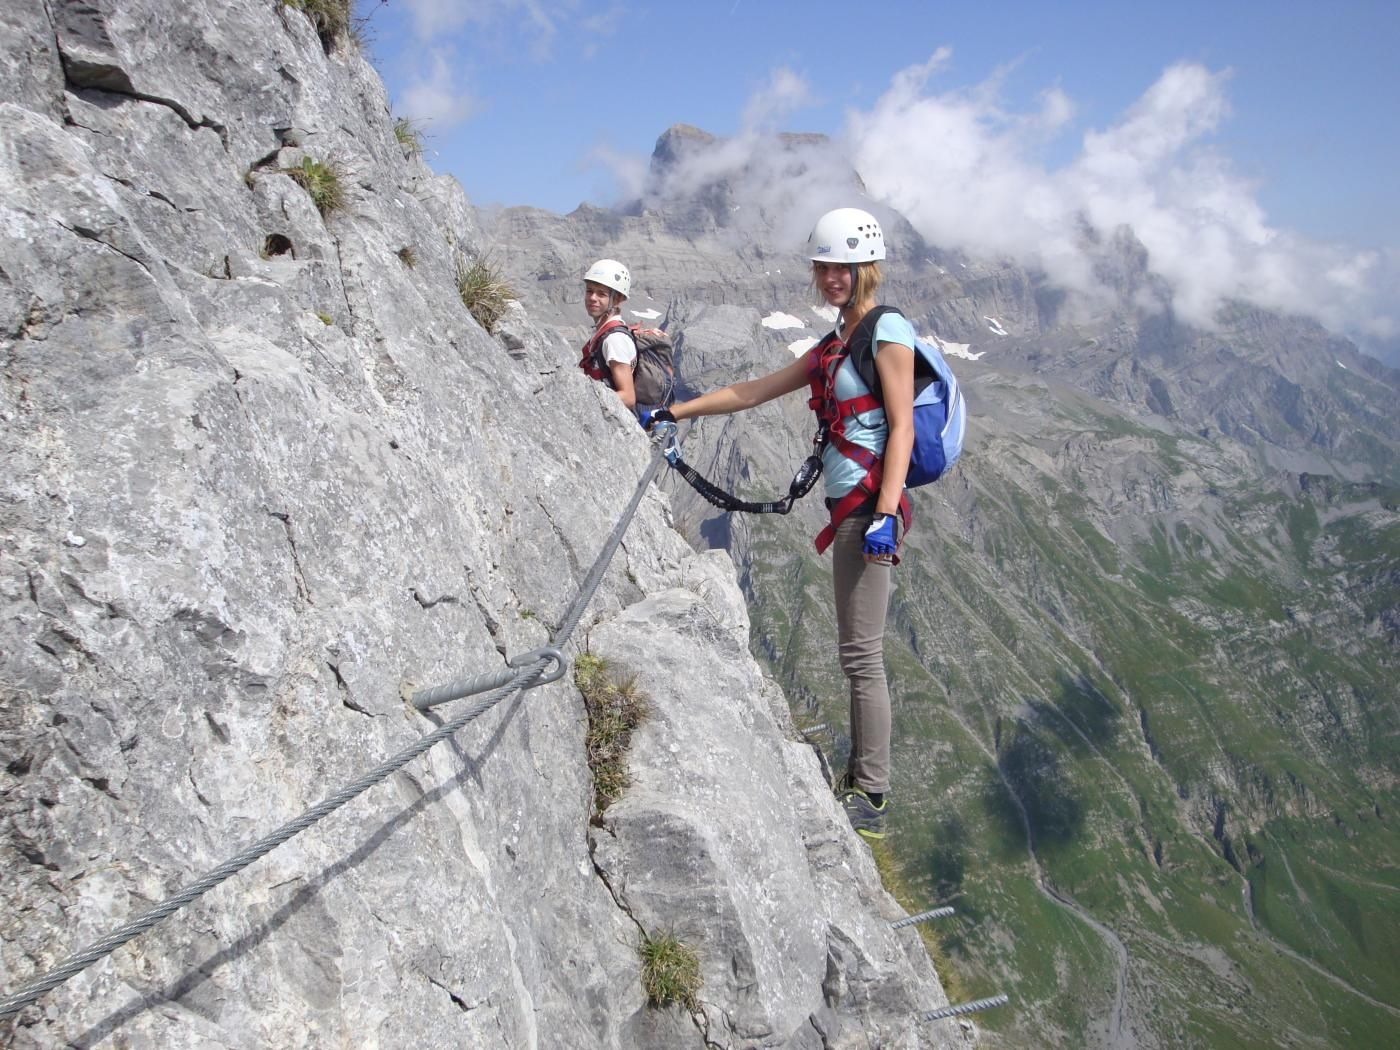 Klettersteig Ferrata : Klettersteig via ferrata mountain pinterest mountains french